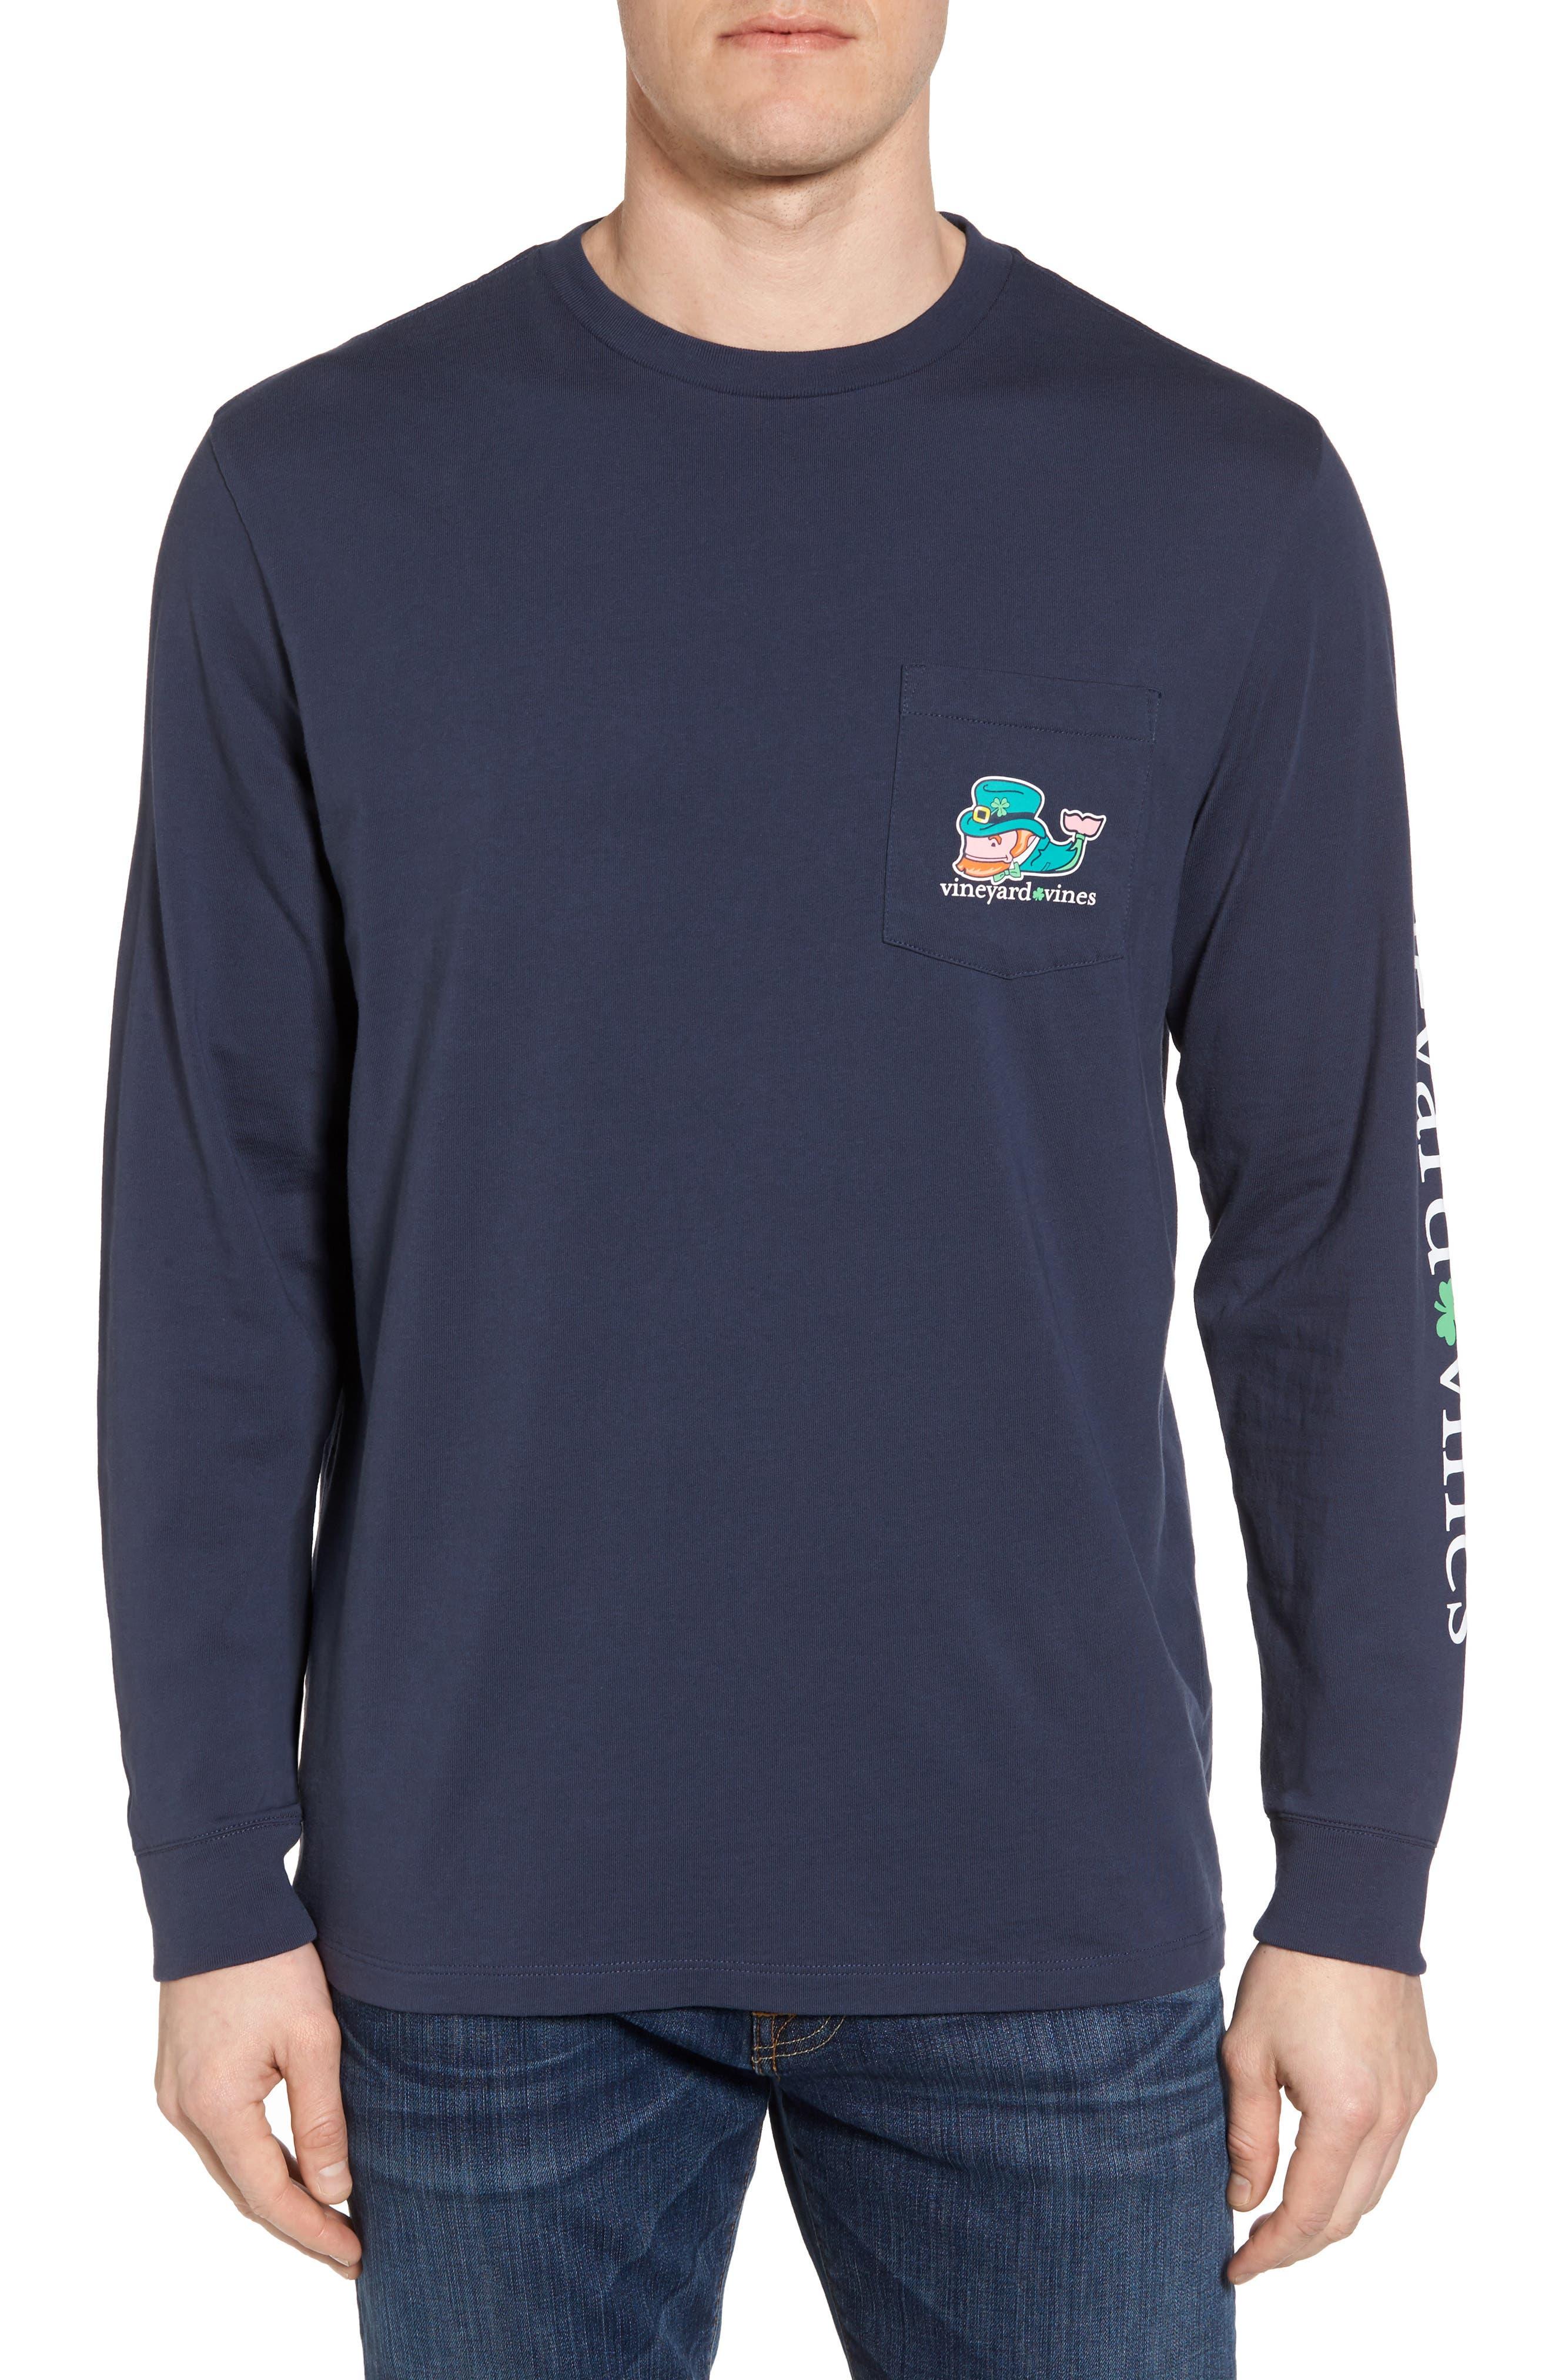 St. Paddy's Day T-Shirt,                             Main thumbnail 1, color,                             406